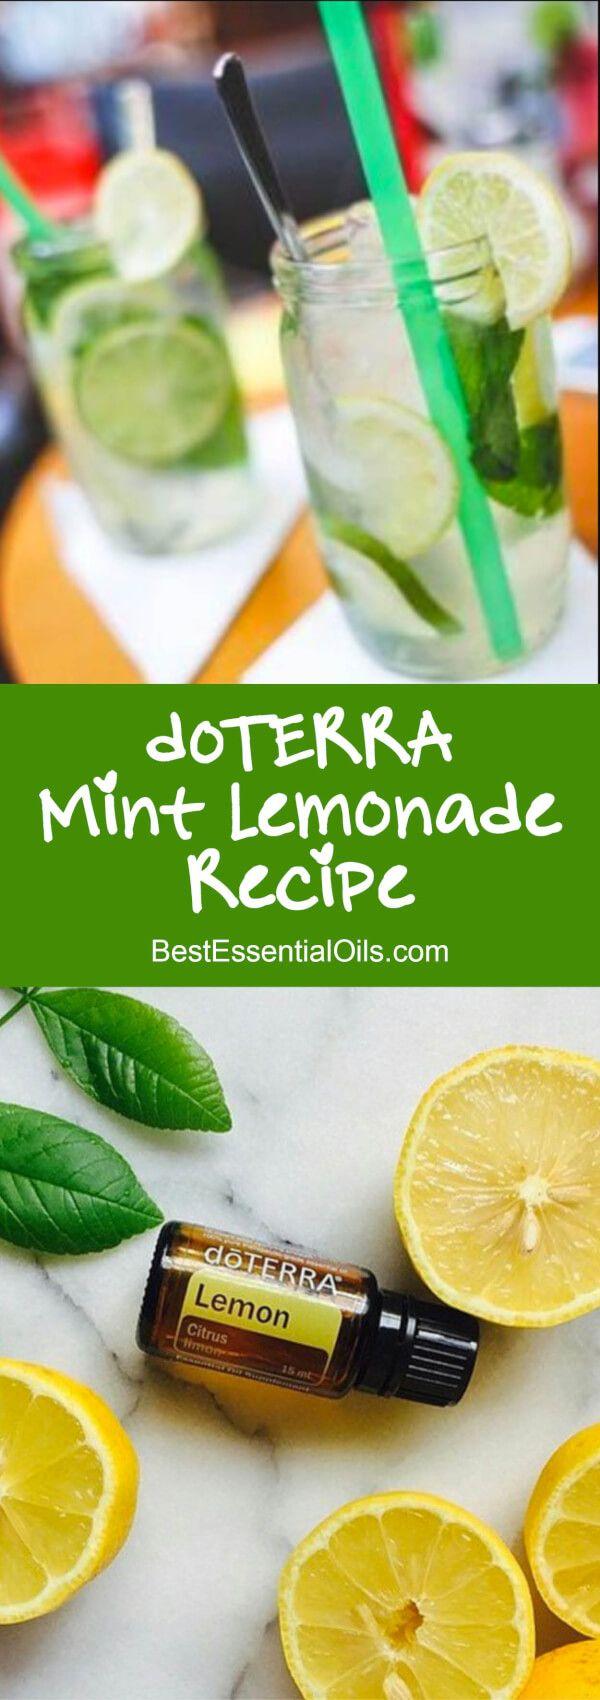 doTERRA Mint Lemonade Recipe